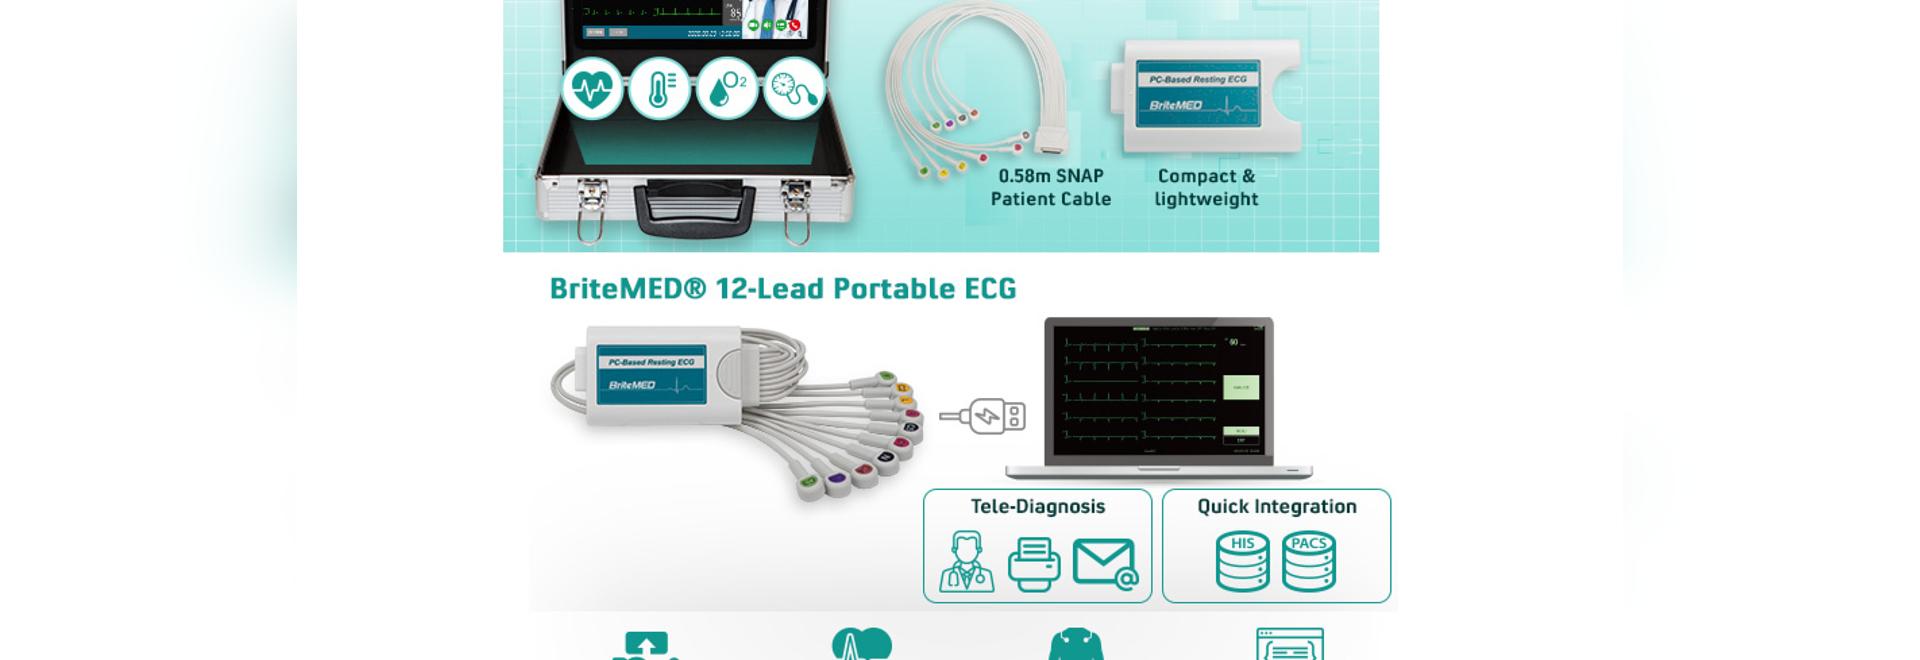 A True Portable ECG Perfect For Telemedicine Kit